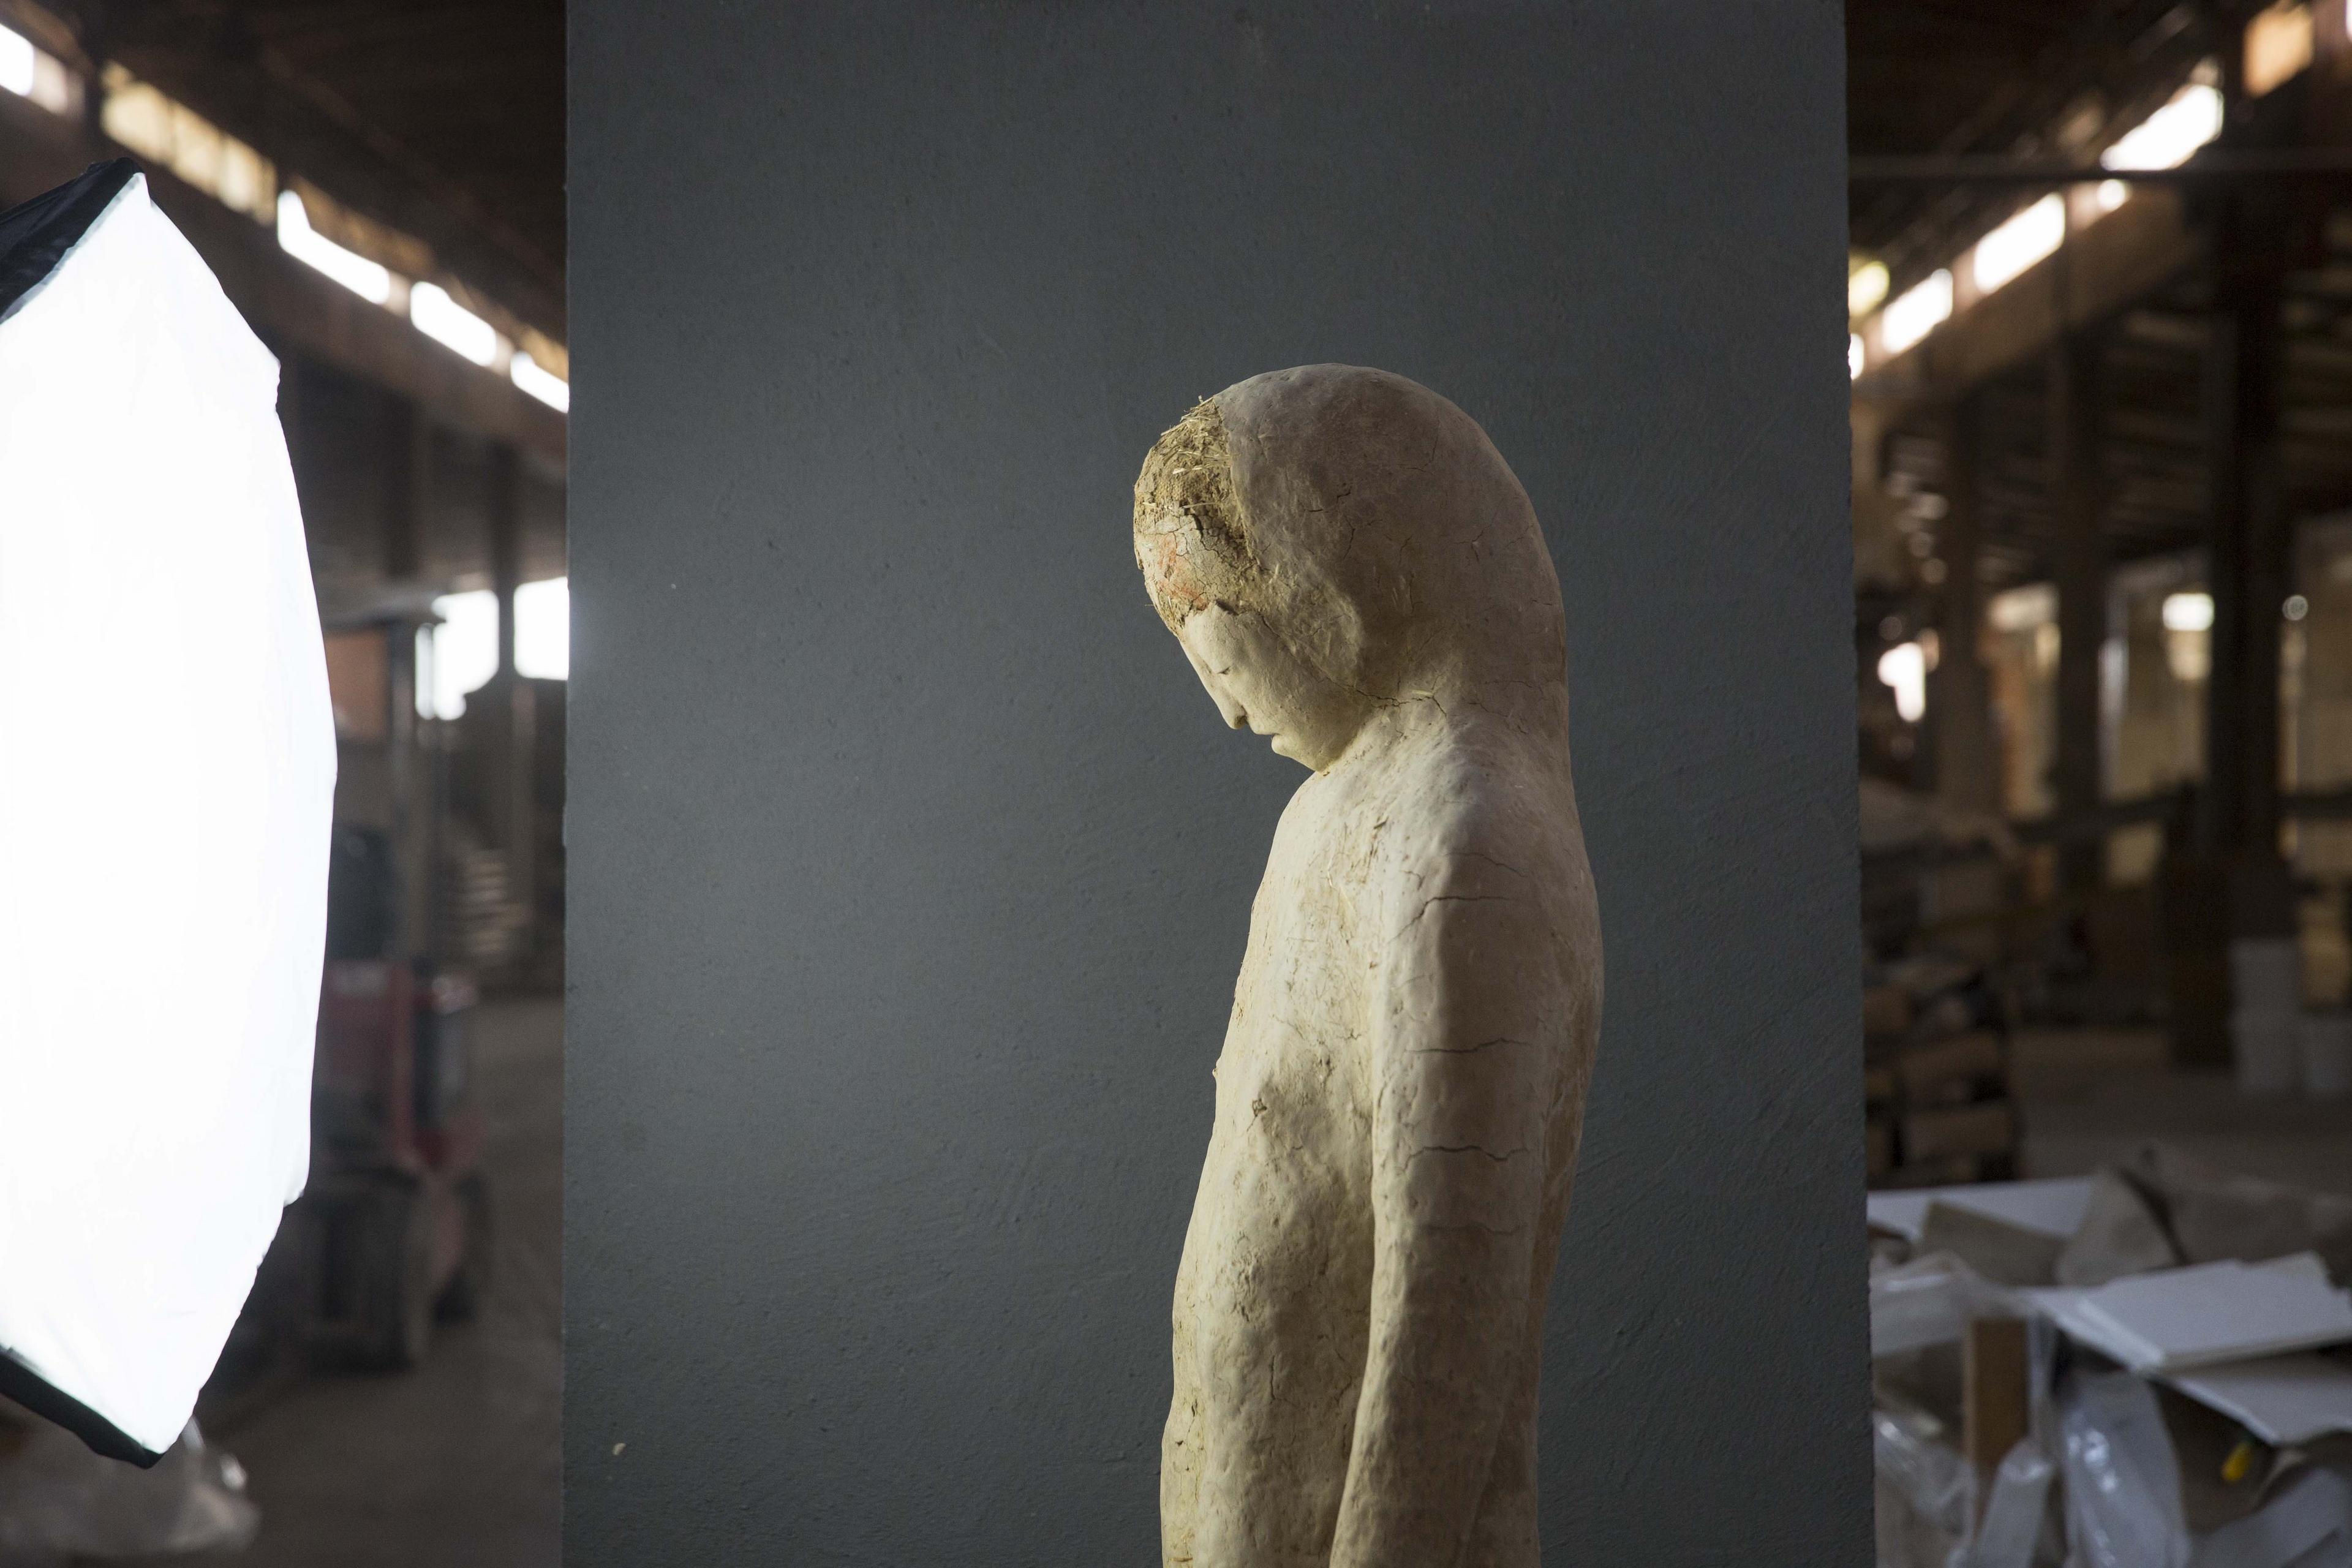 Roberta Busato at work in Matteo Brioni atelier, photo by Giuseppe Gradella